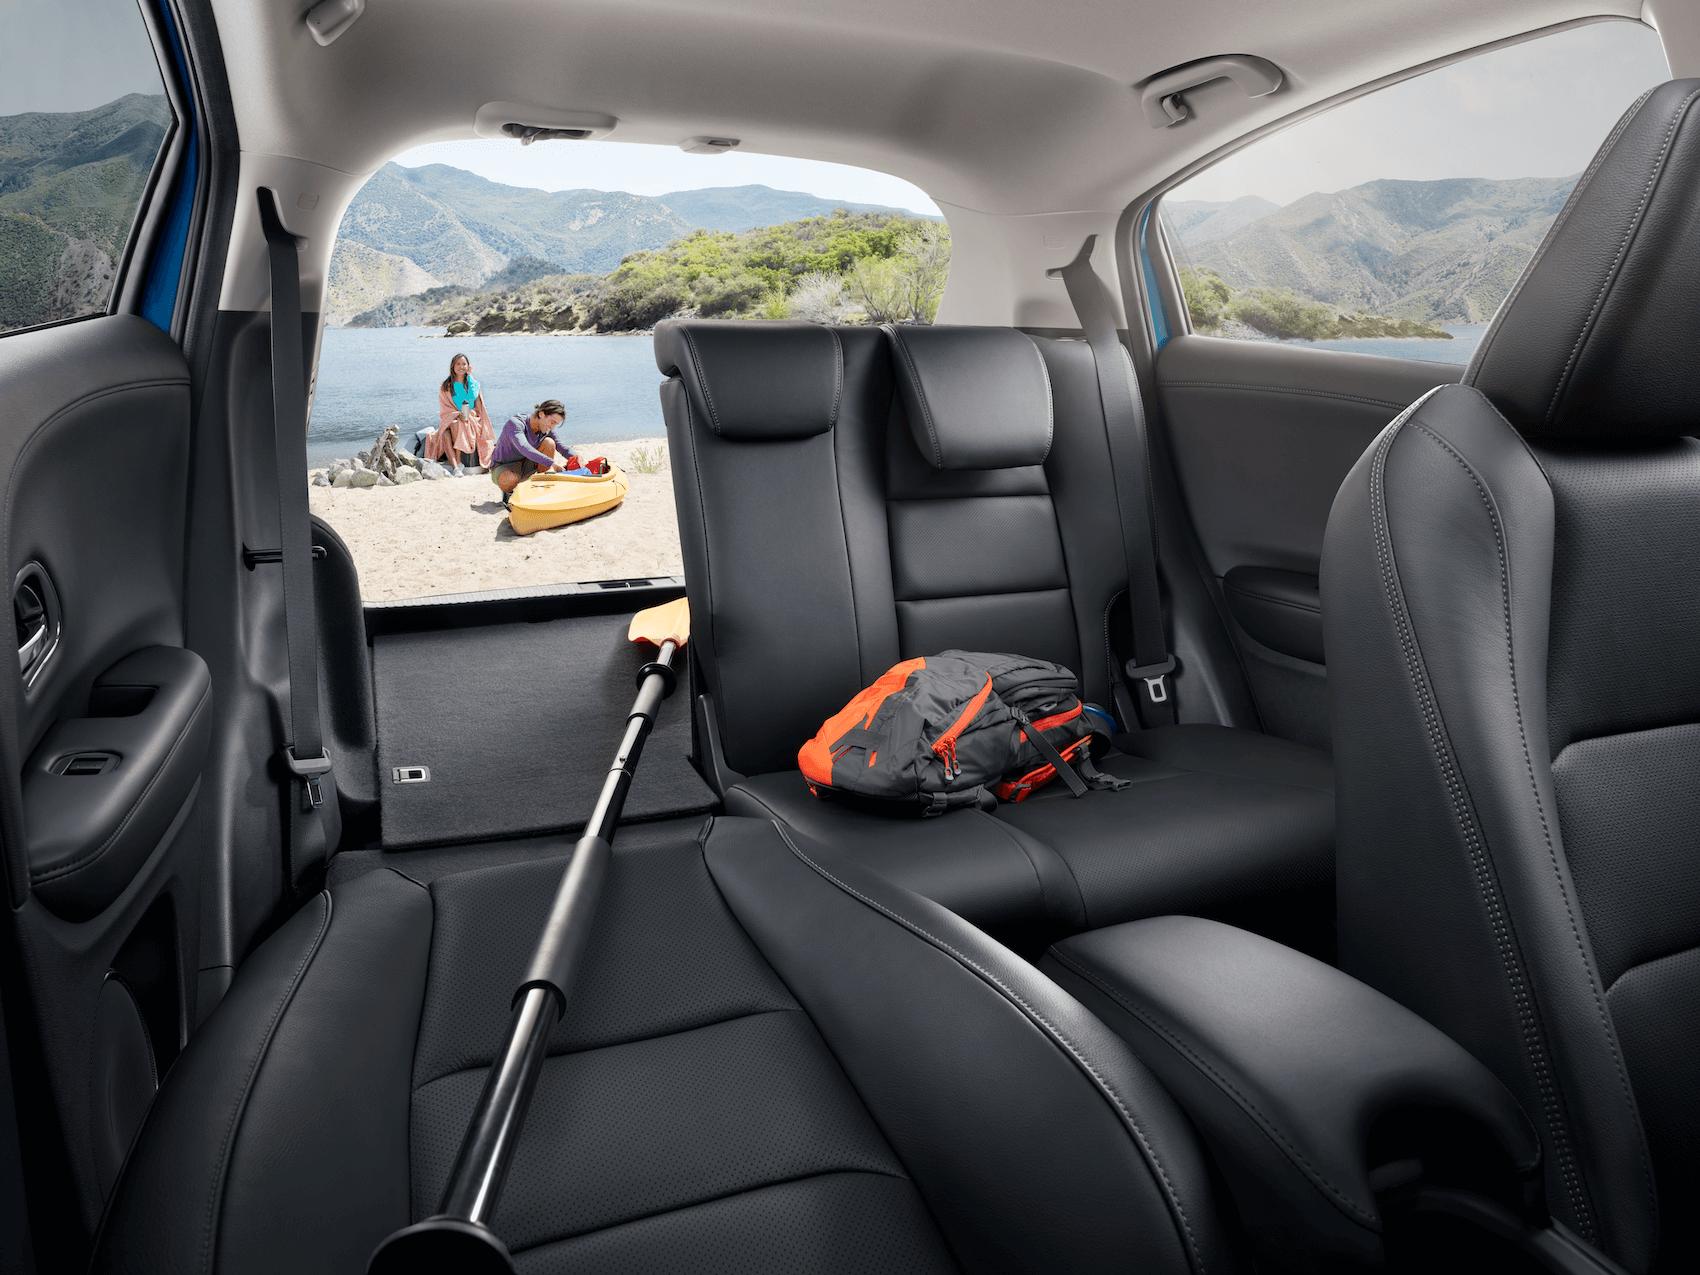 Honda HR-V Cabin Features